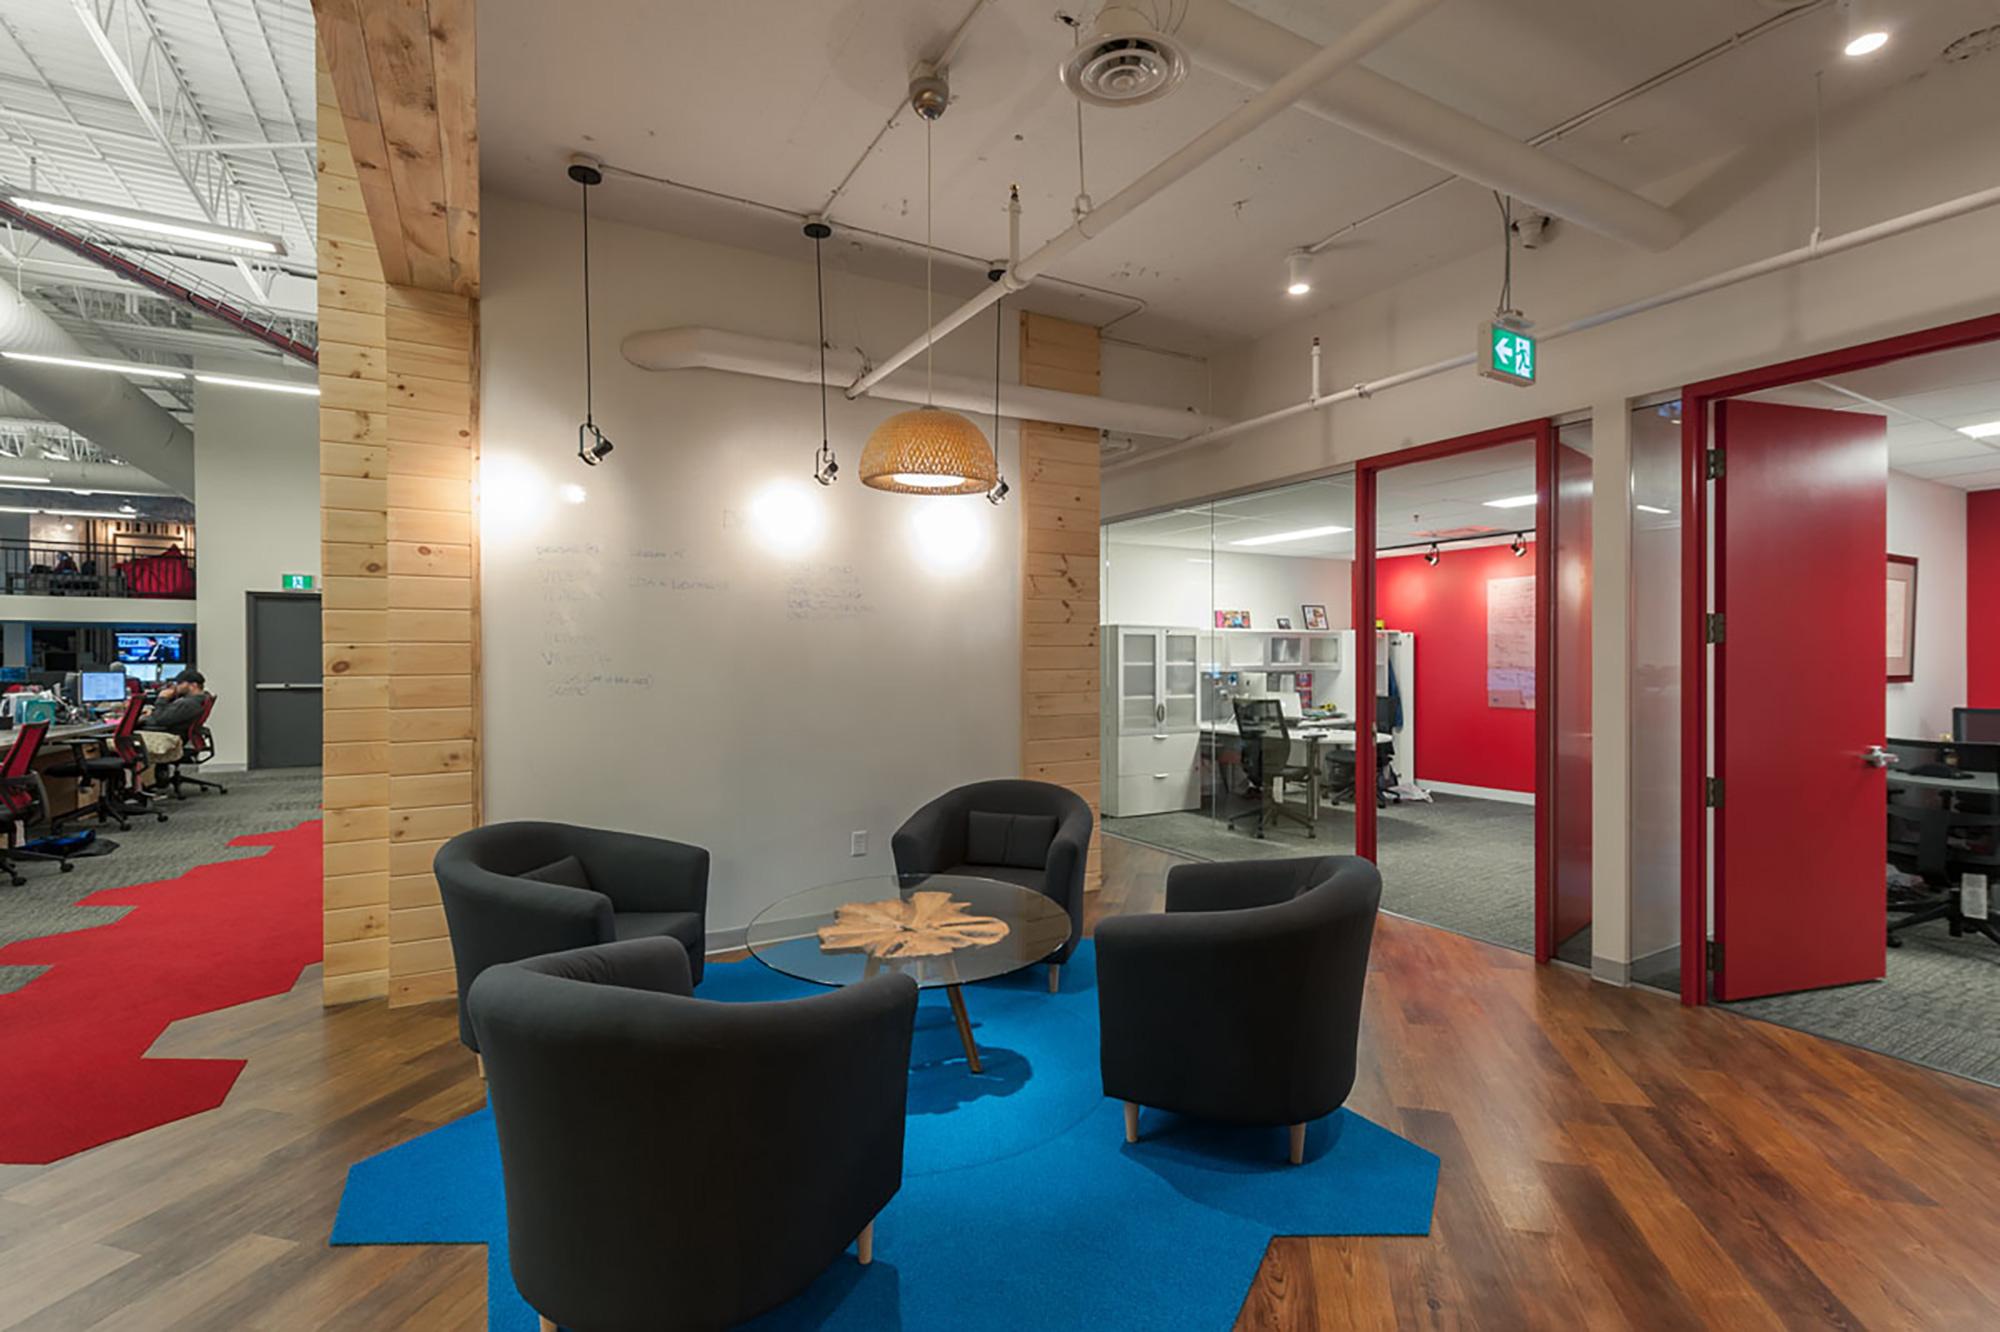 interior-design-corporate-office-seating.jpg